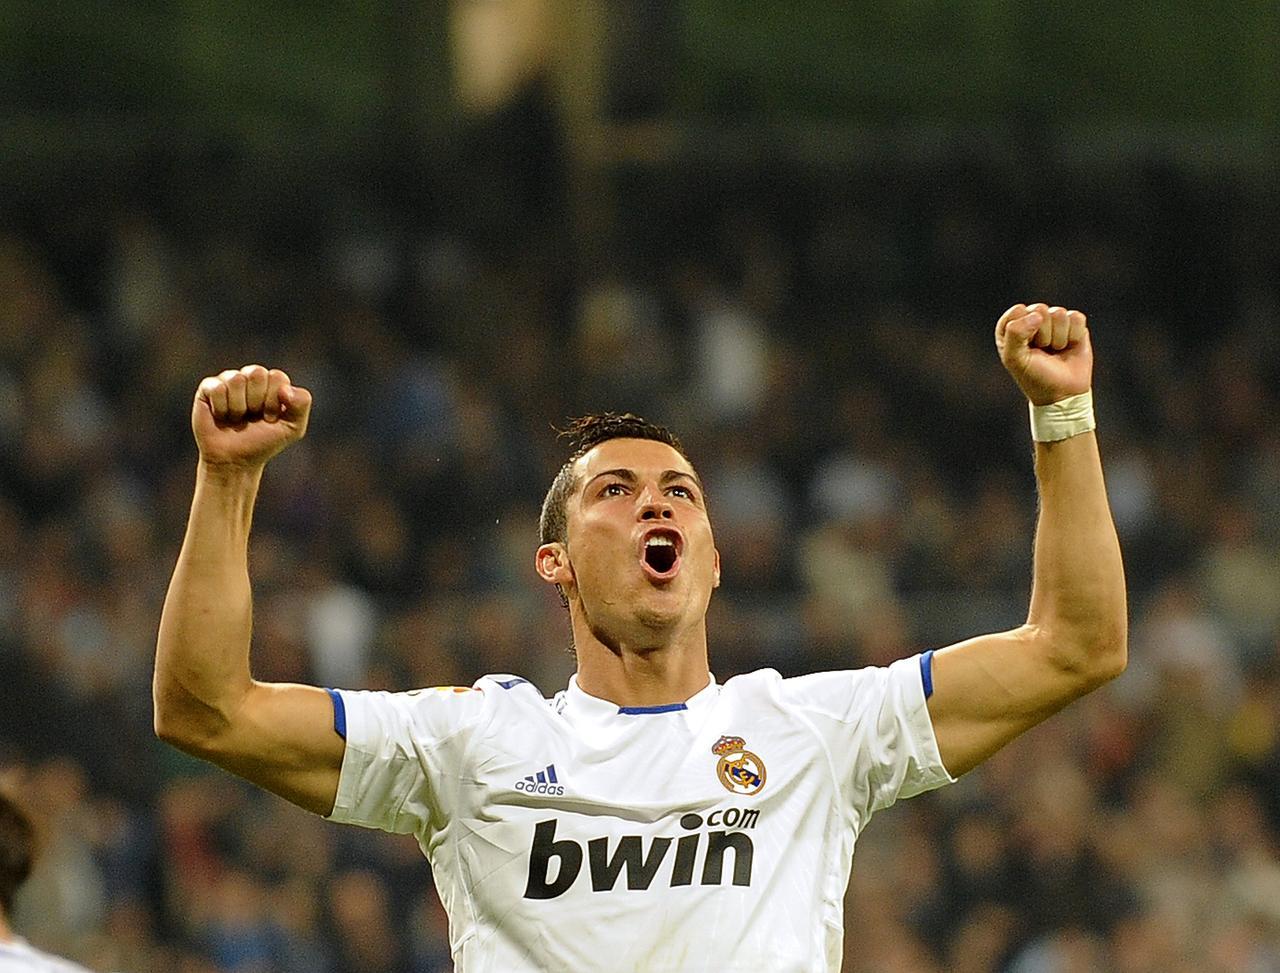 http://1.bp.blogspot.com/-0GVkSNGQsw0/T5hfOkXsmAI/AAAAAAAAQD4/fK7uaL4pU74/s1600/Wallpaper_CR7_Cristiano_Ronaldo_real_madrid+(15).jpg